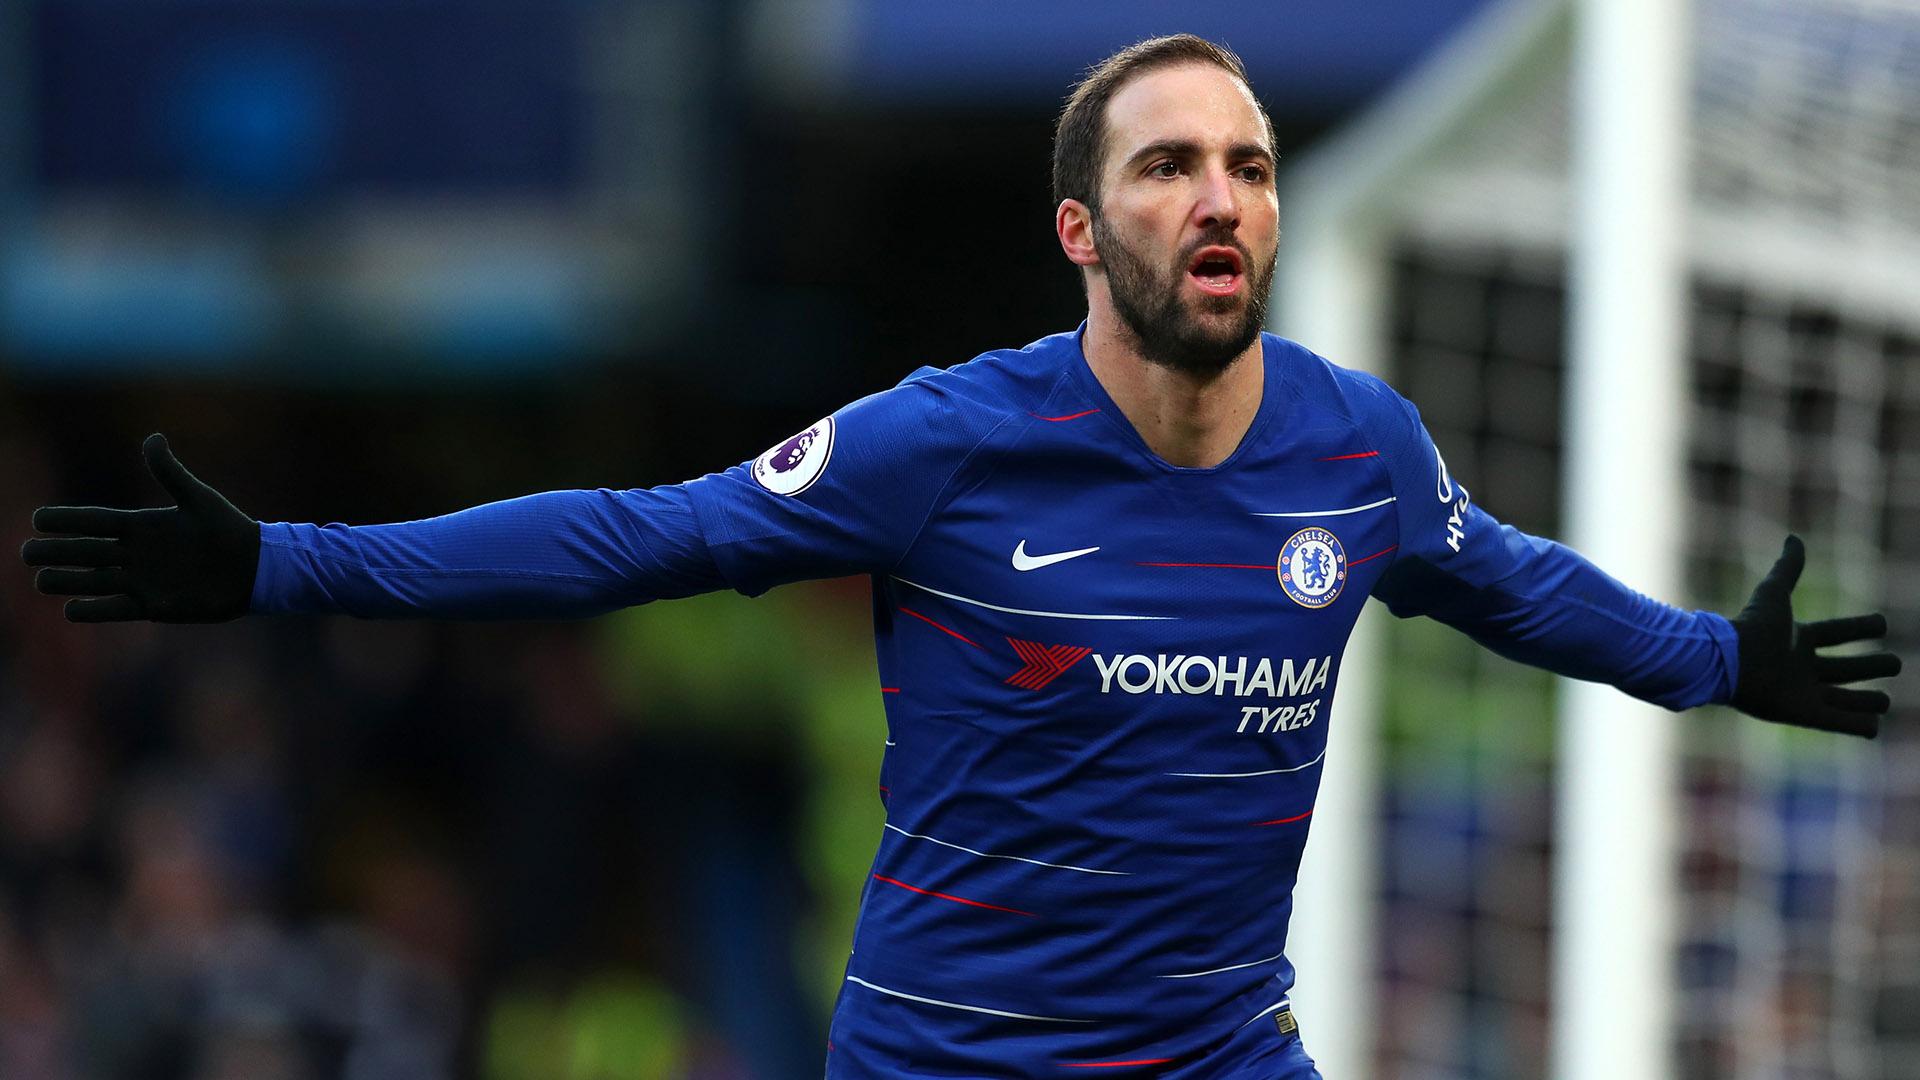 Manchester City Chelsea: Manchester City Vs Chelsea: TV Channel, Live Stream, Squad